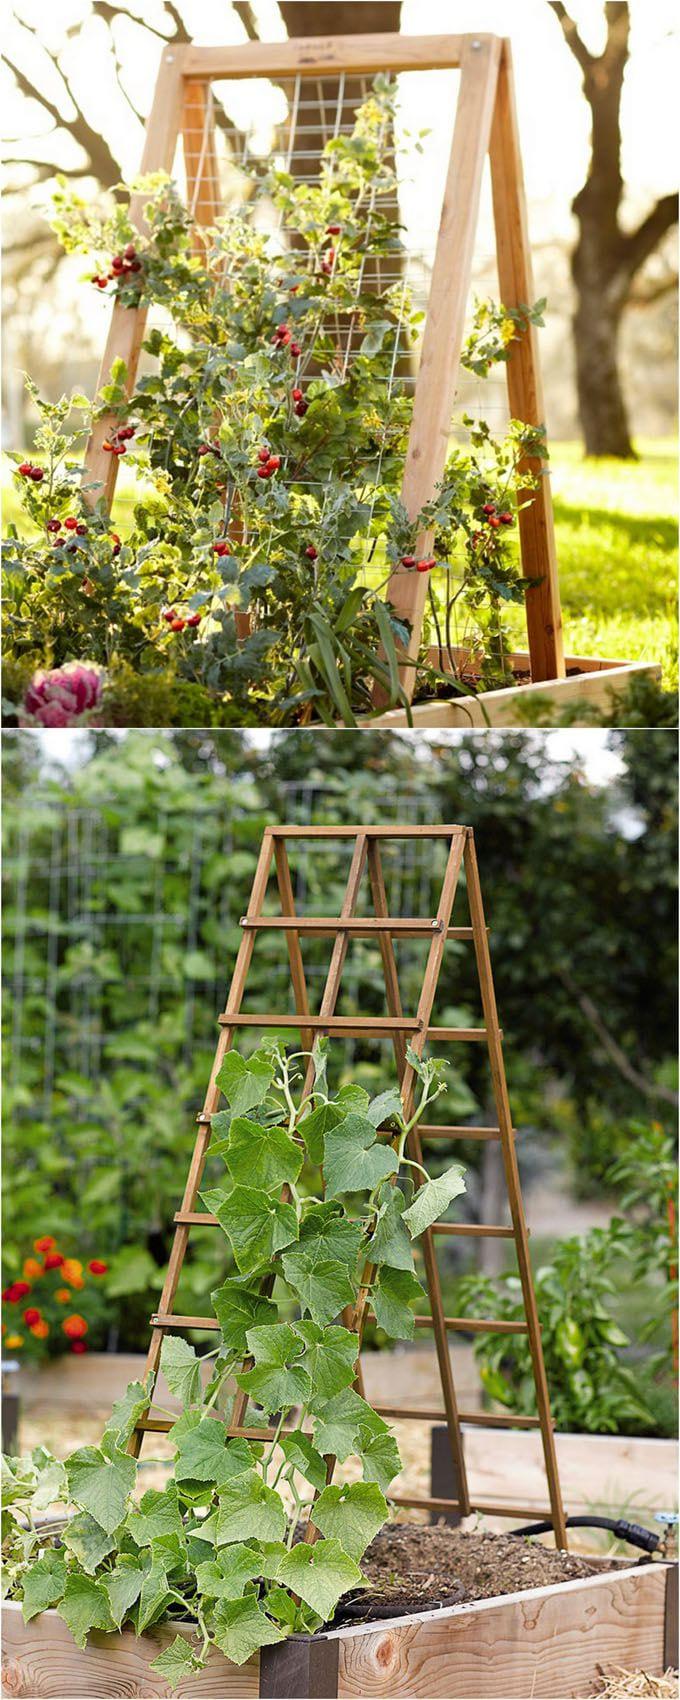 Simphome.com easy diy garden trellis ideas vertical growing structures a throughout years 2021 2022 2020